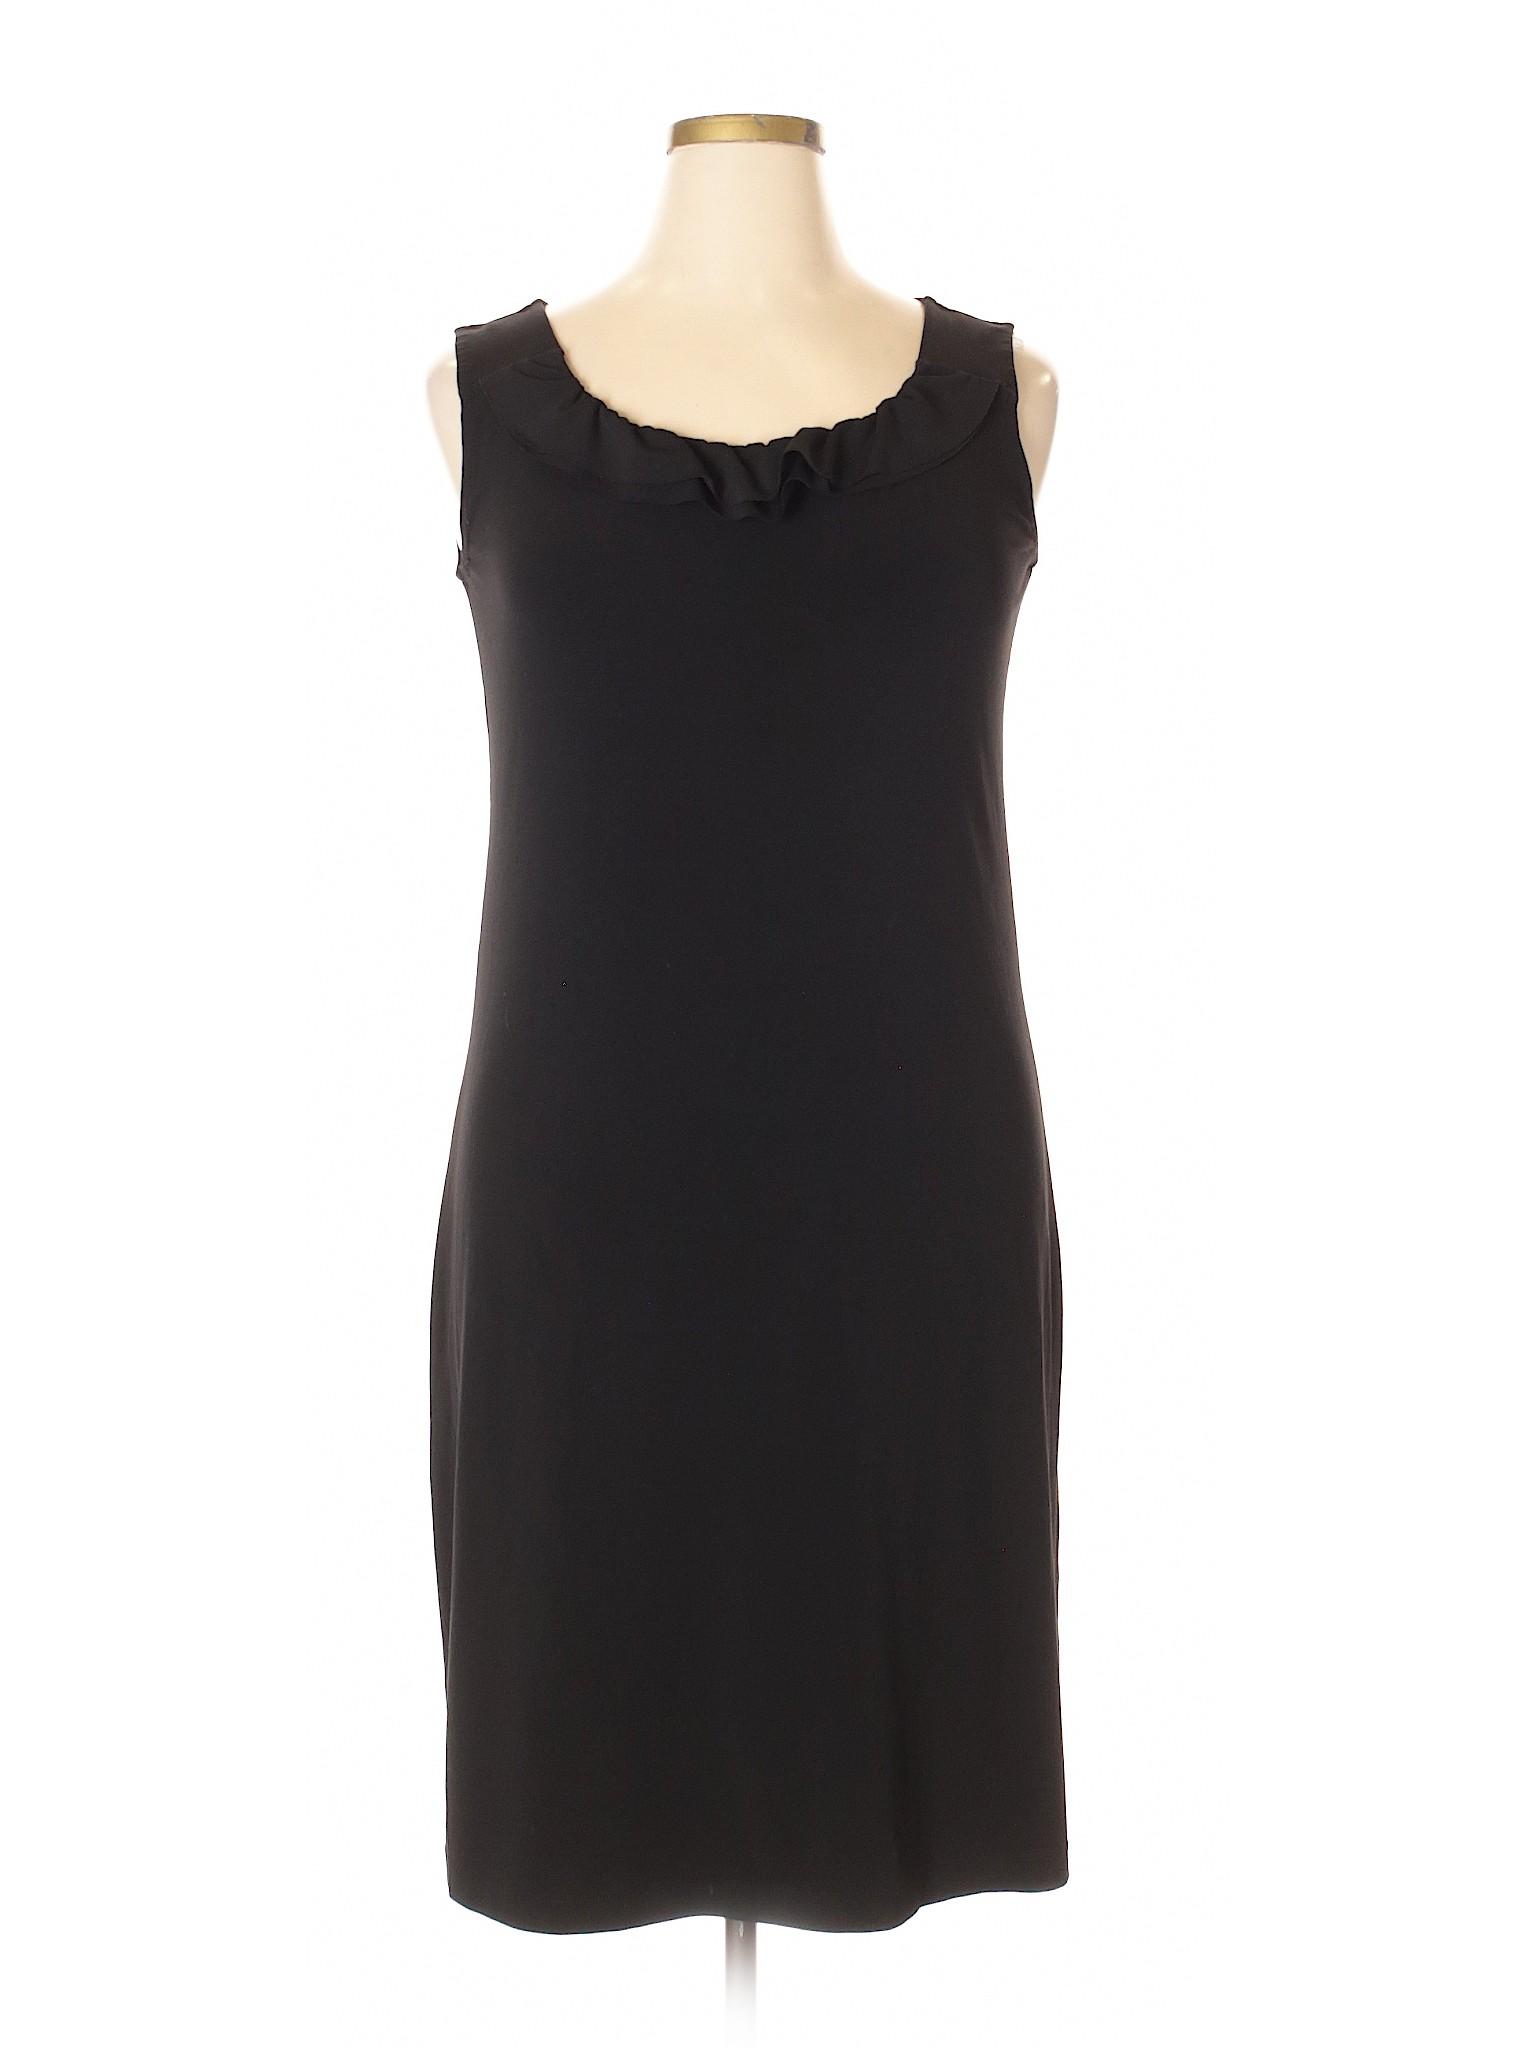 winter Boutique Buchman Casual Dana Dress Uwq0wT1OxW